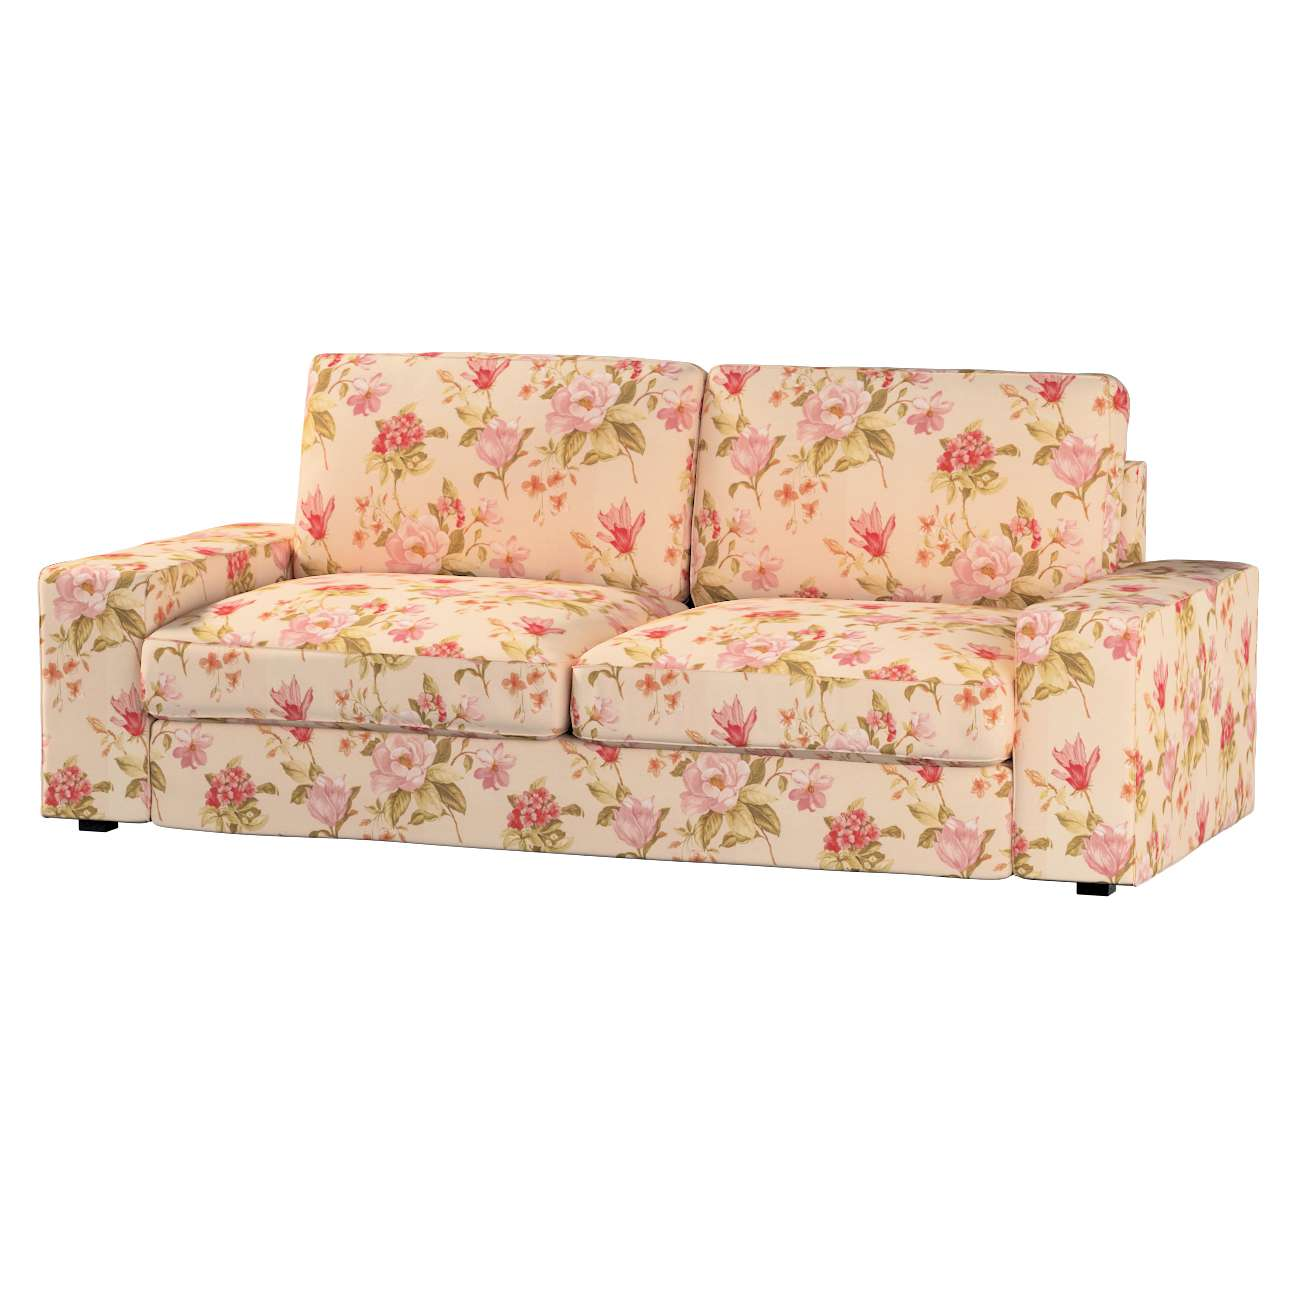 Kivik 3-Sitzer Sofabezug Sofa Kivik 3-Sitzer von der Kollektion Londres, Stoff: 123-05